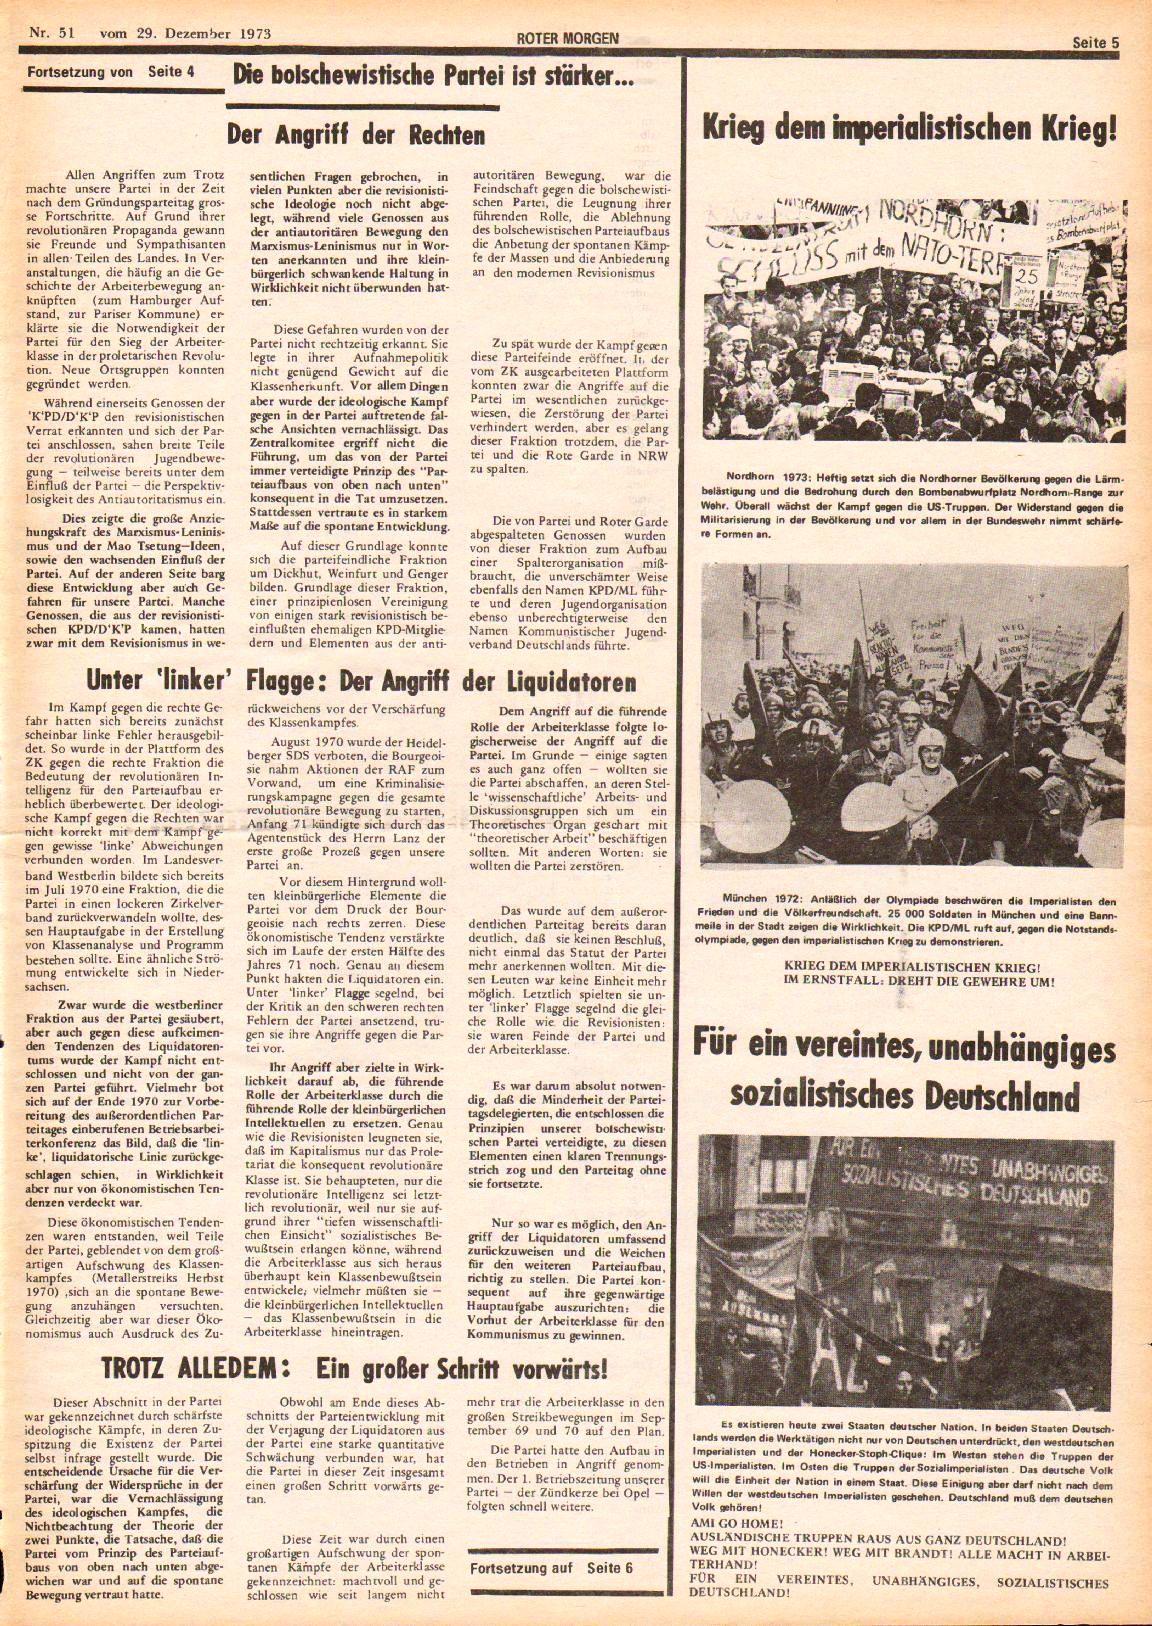 Roter Morgen, 7. Jg., 29. Dezember 1973, Nr. 51, Seite 5